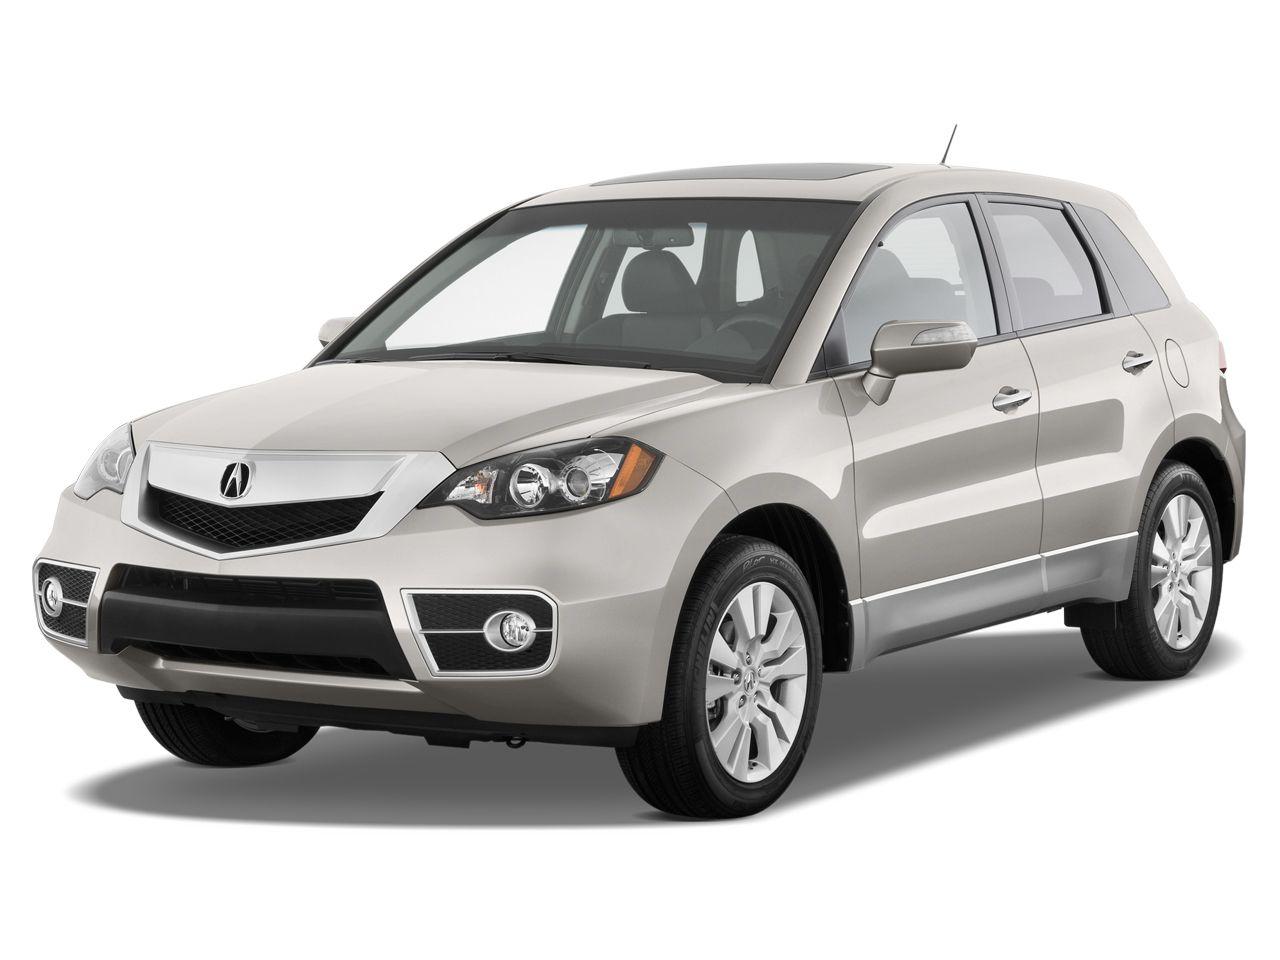 2012 acura rdx review cheap car insurance car insurance